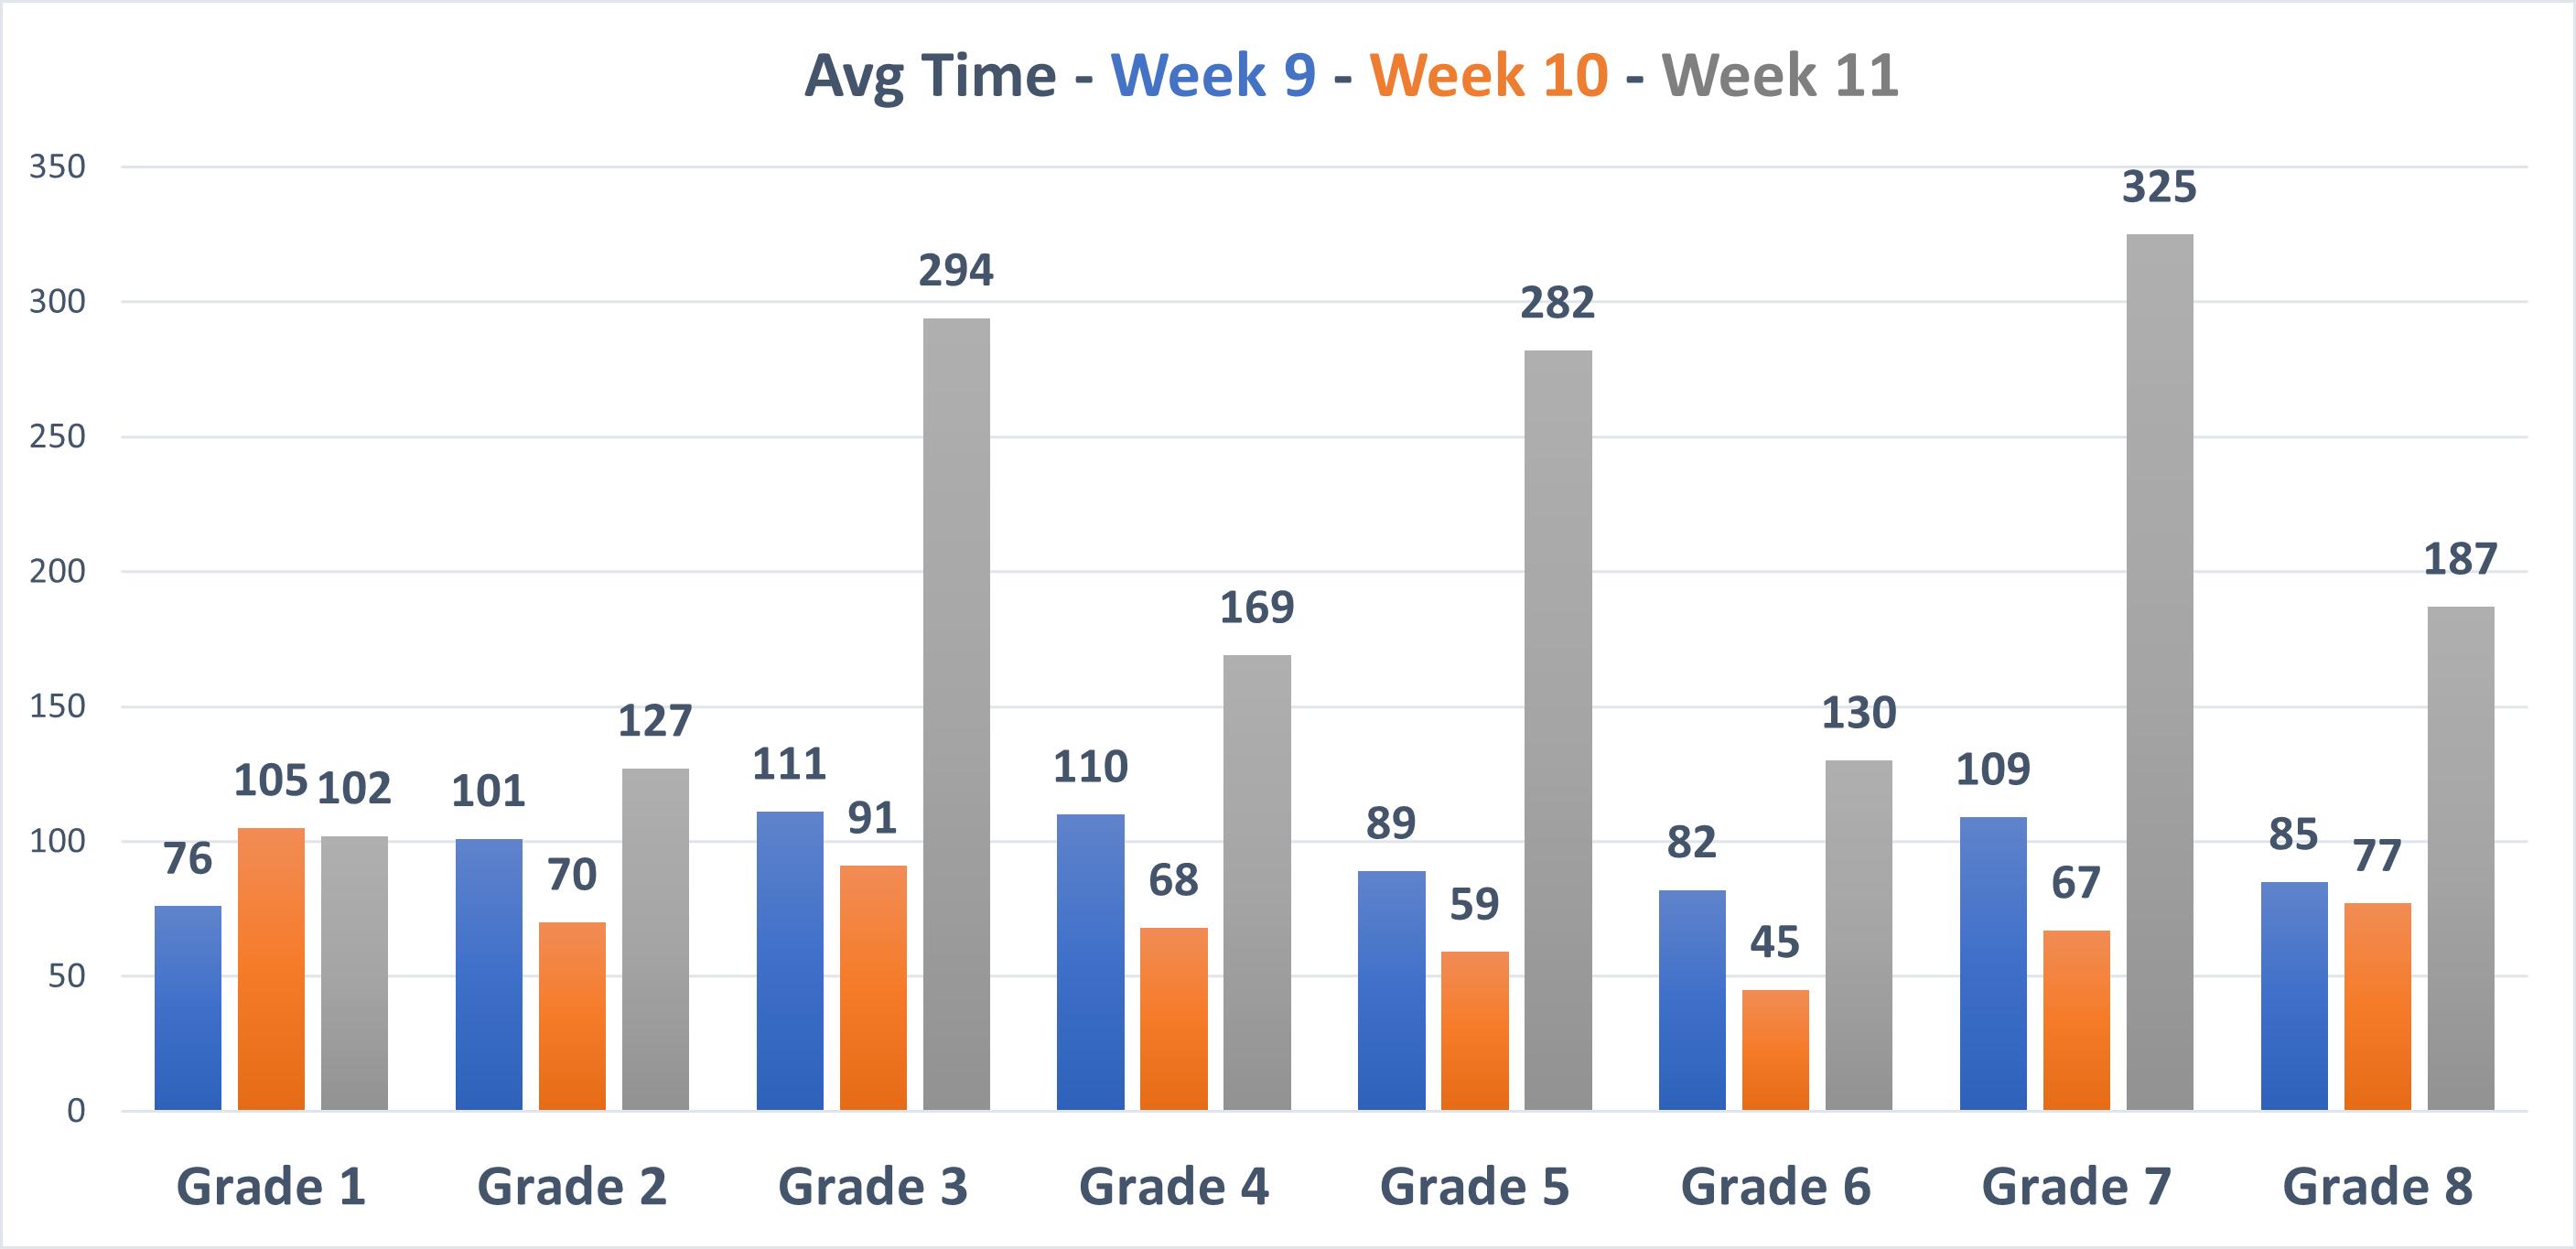 Summit International School Average Time Spent Report